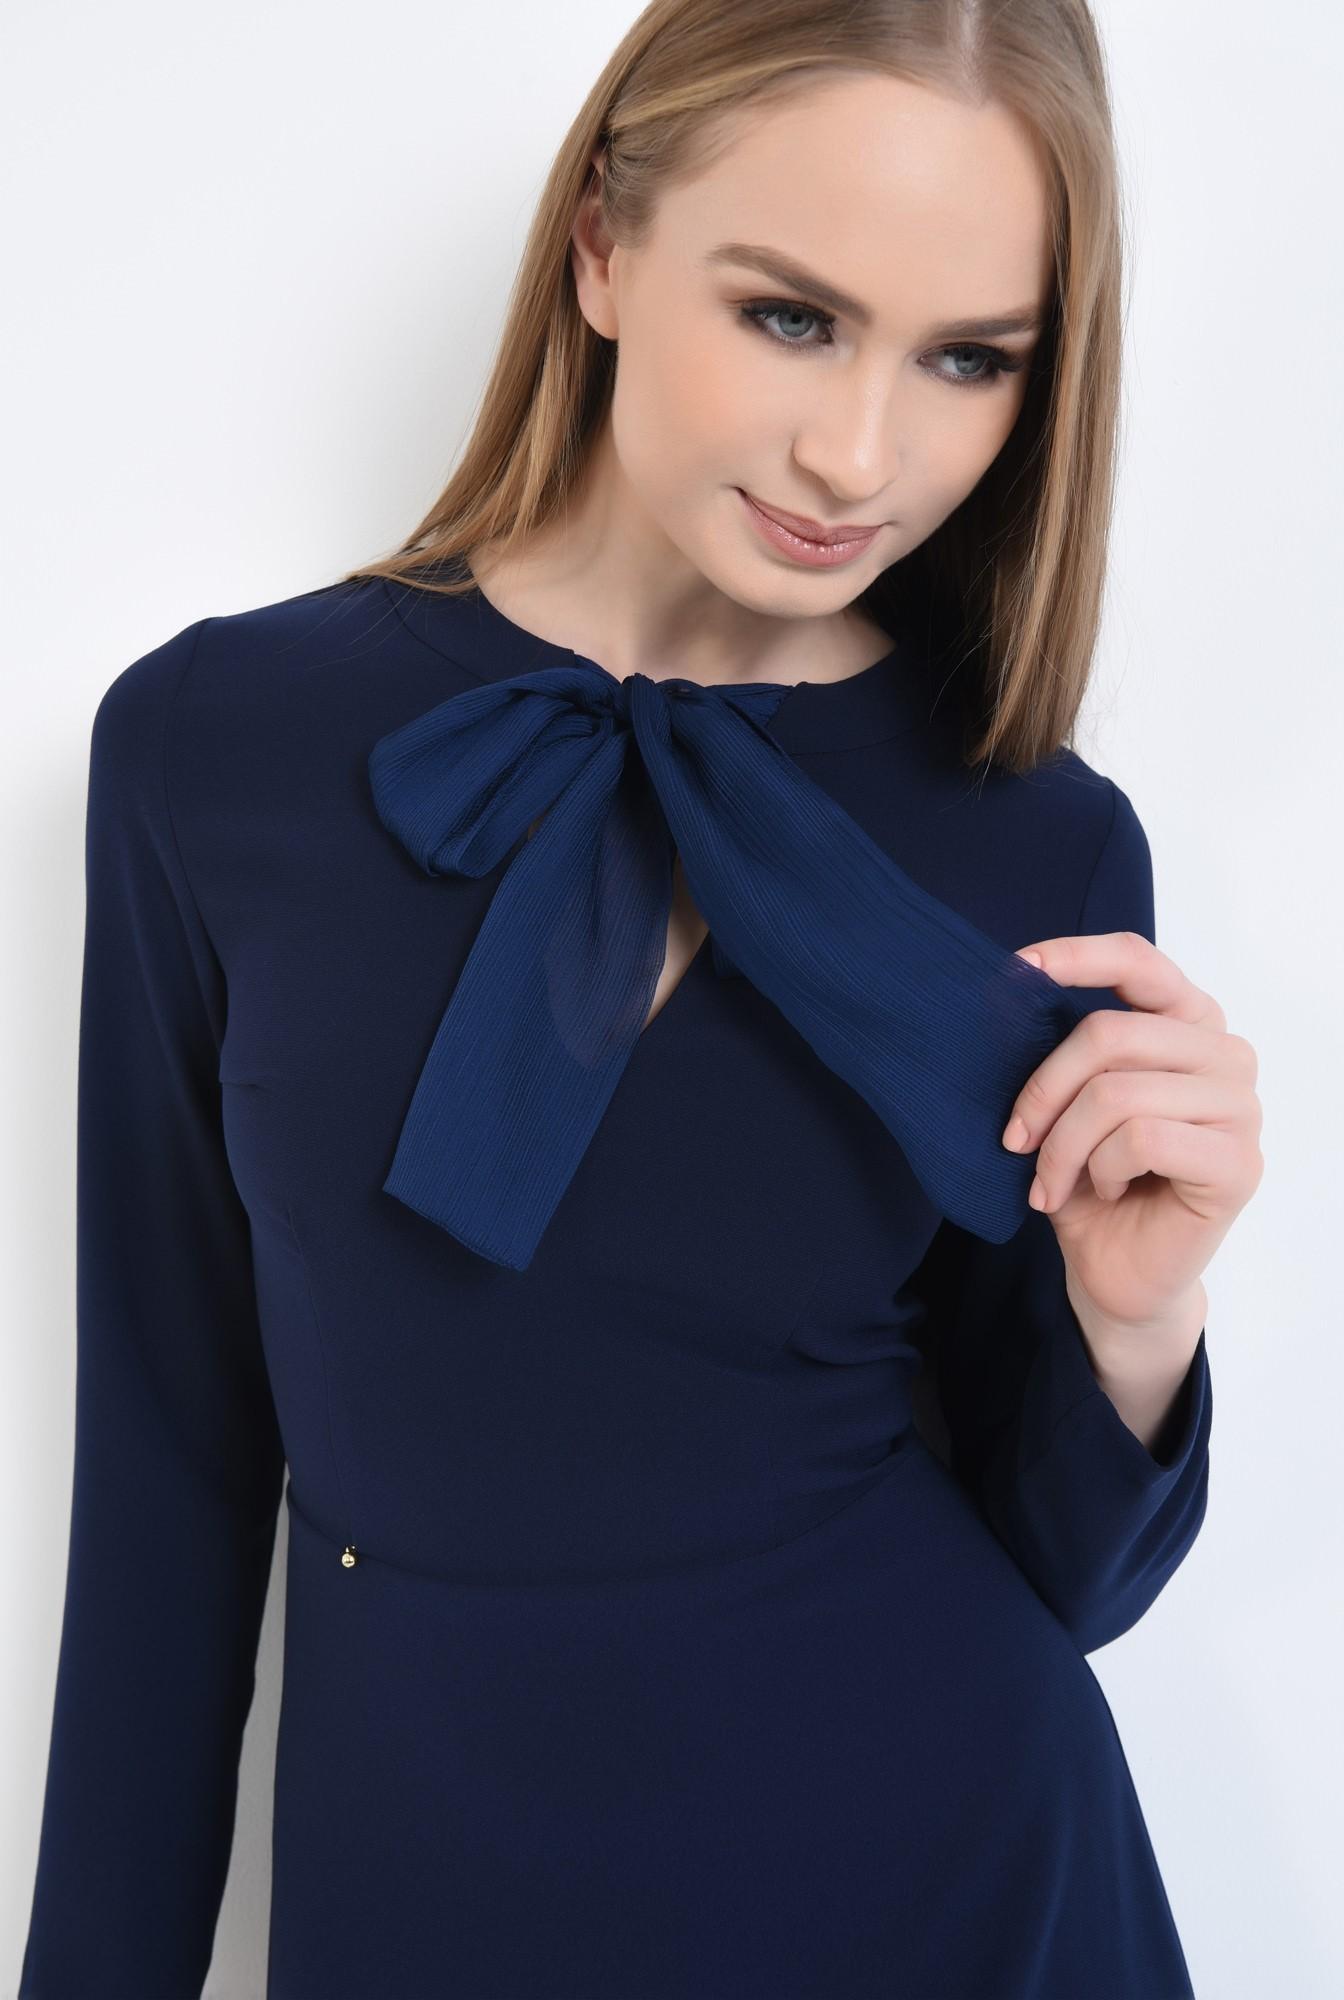 2 - rochie mini, croi A-line, talie cambrata, rochii online